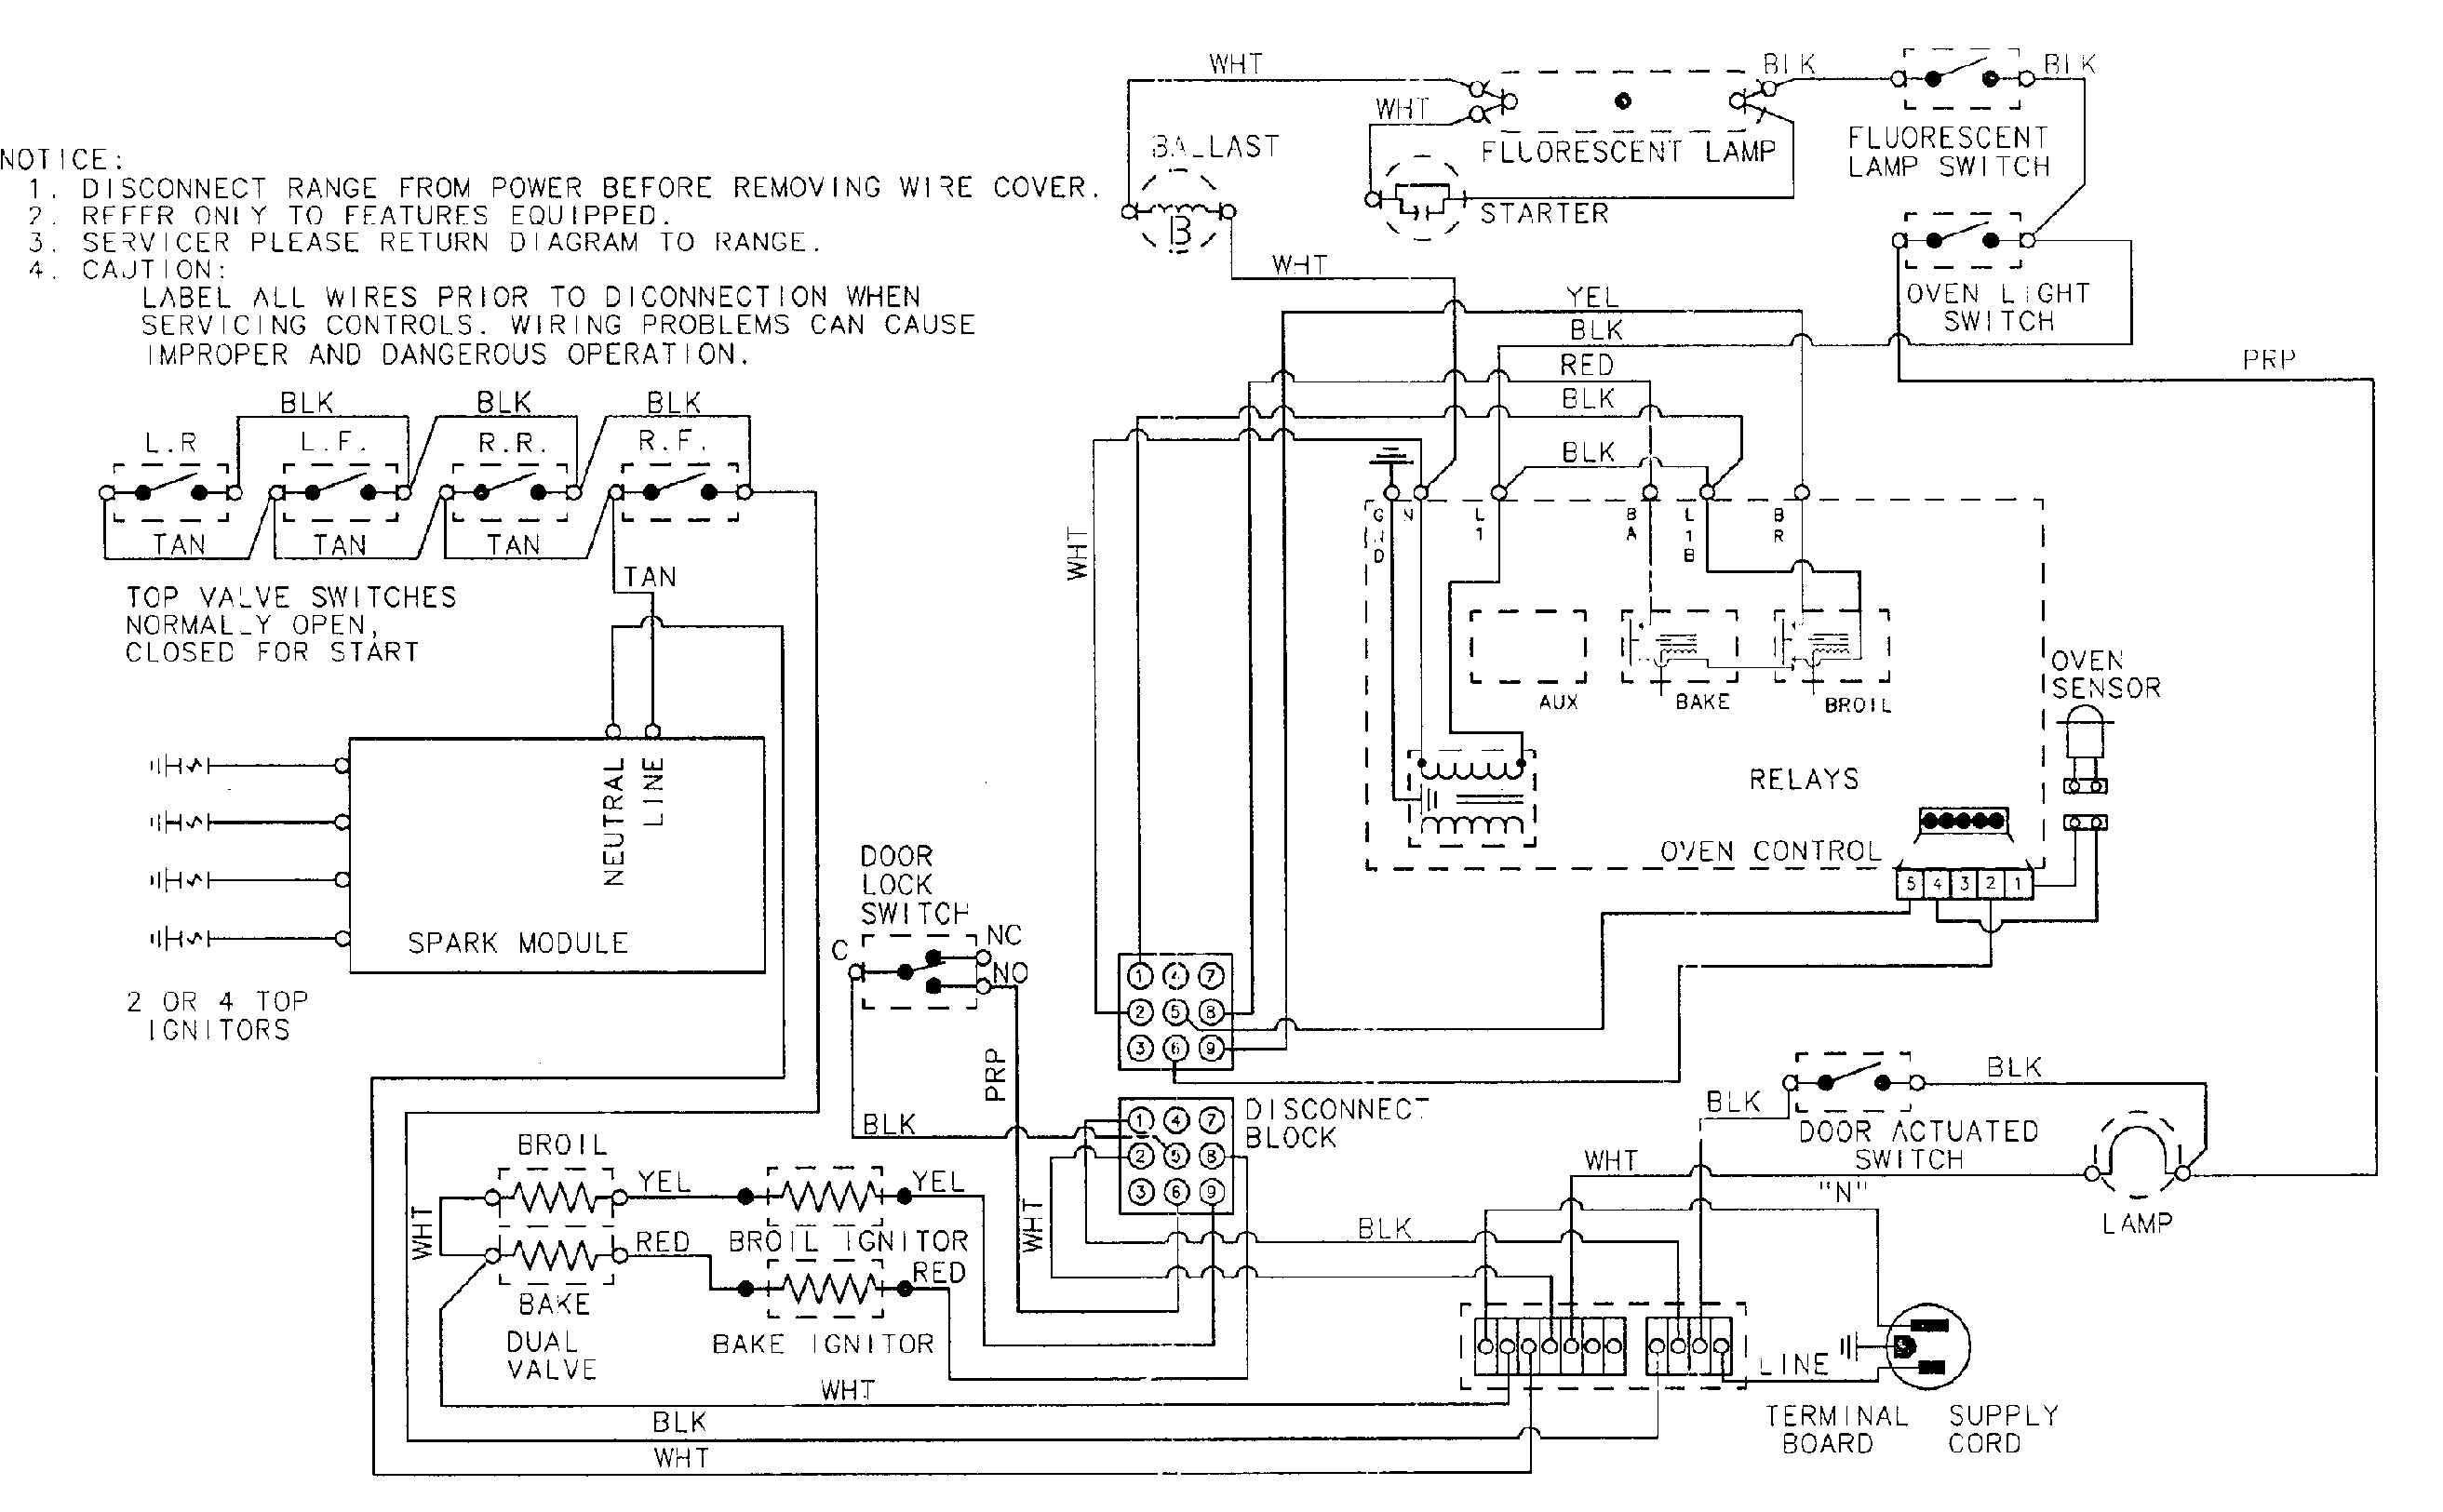 maytag atlantis dryer wire diagram: maytag electric dryer wiring